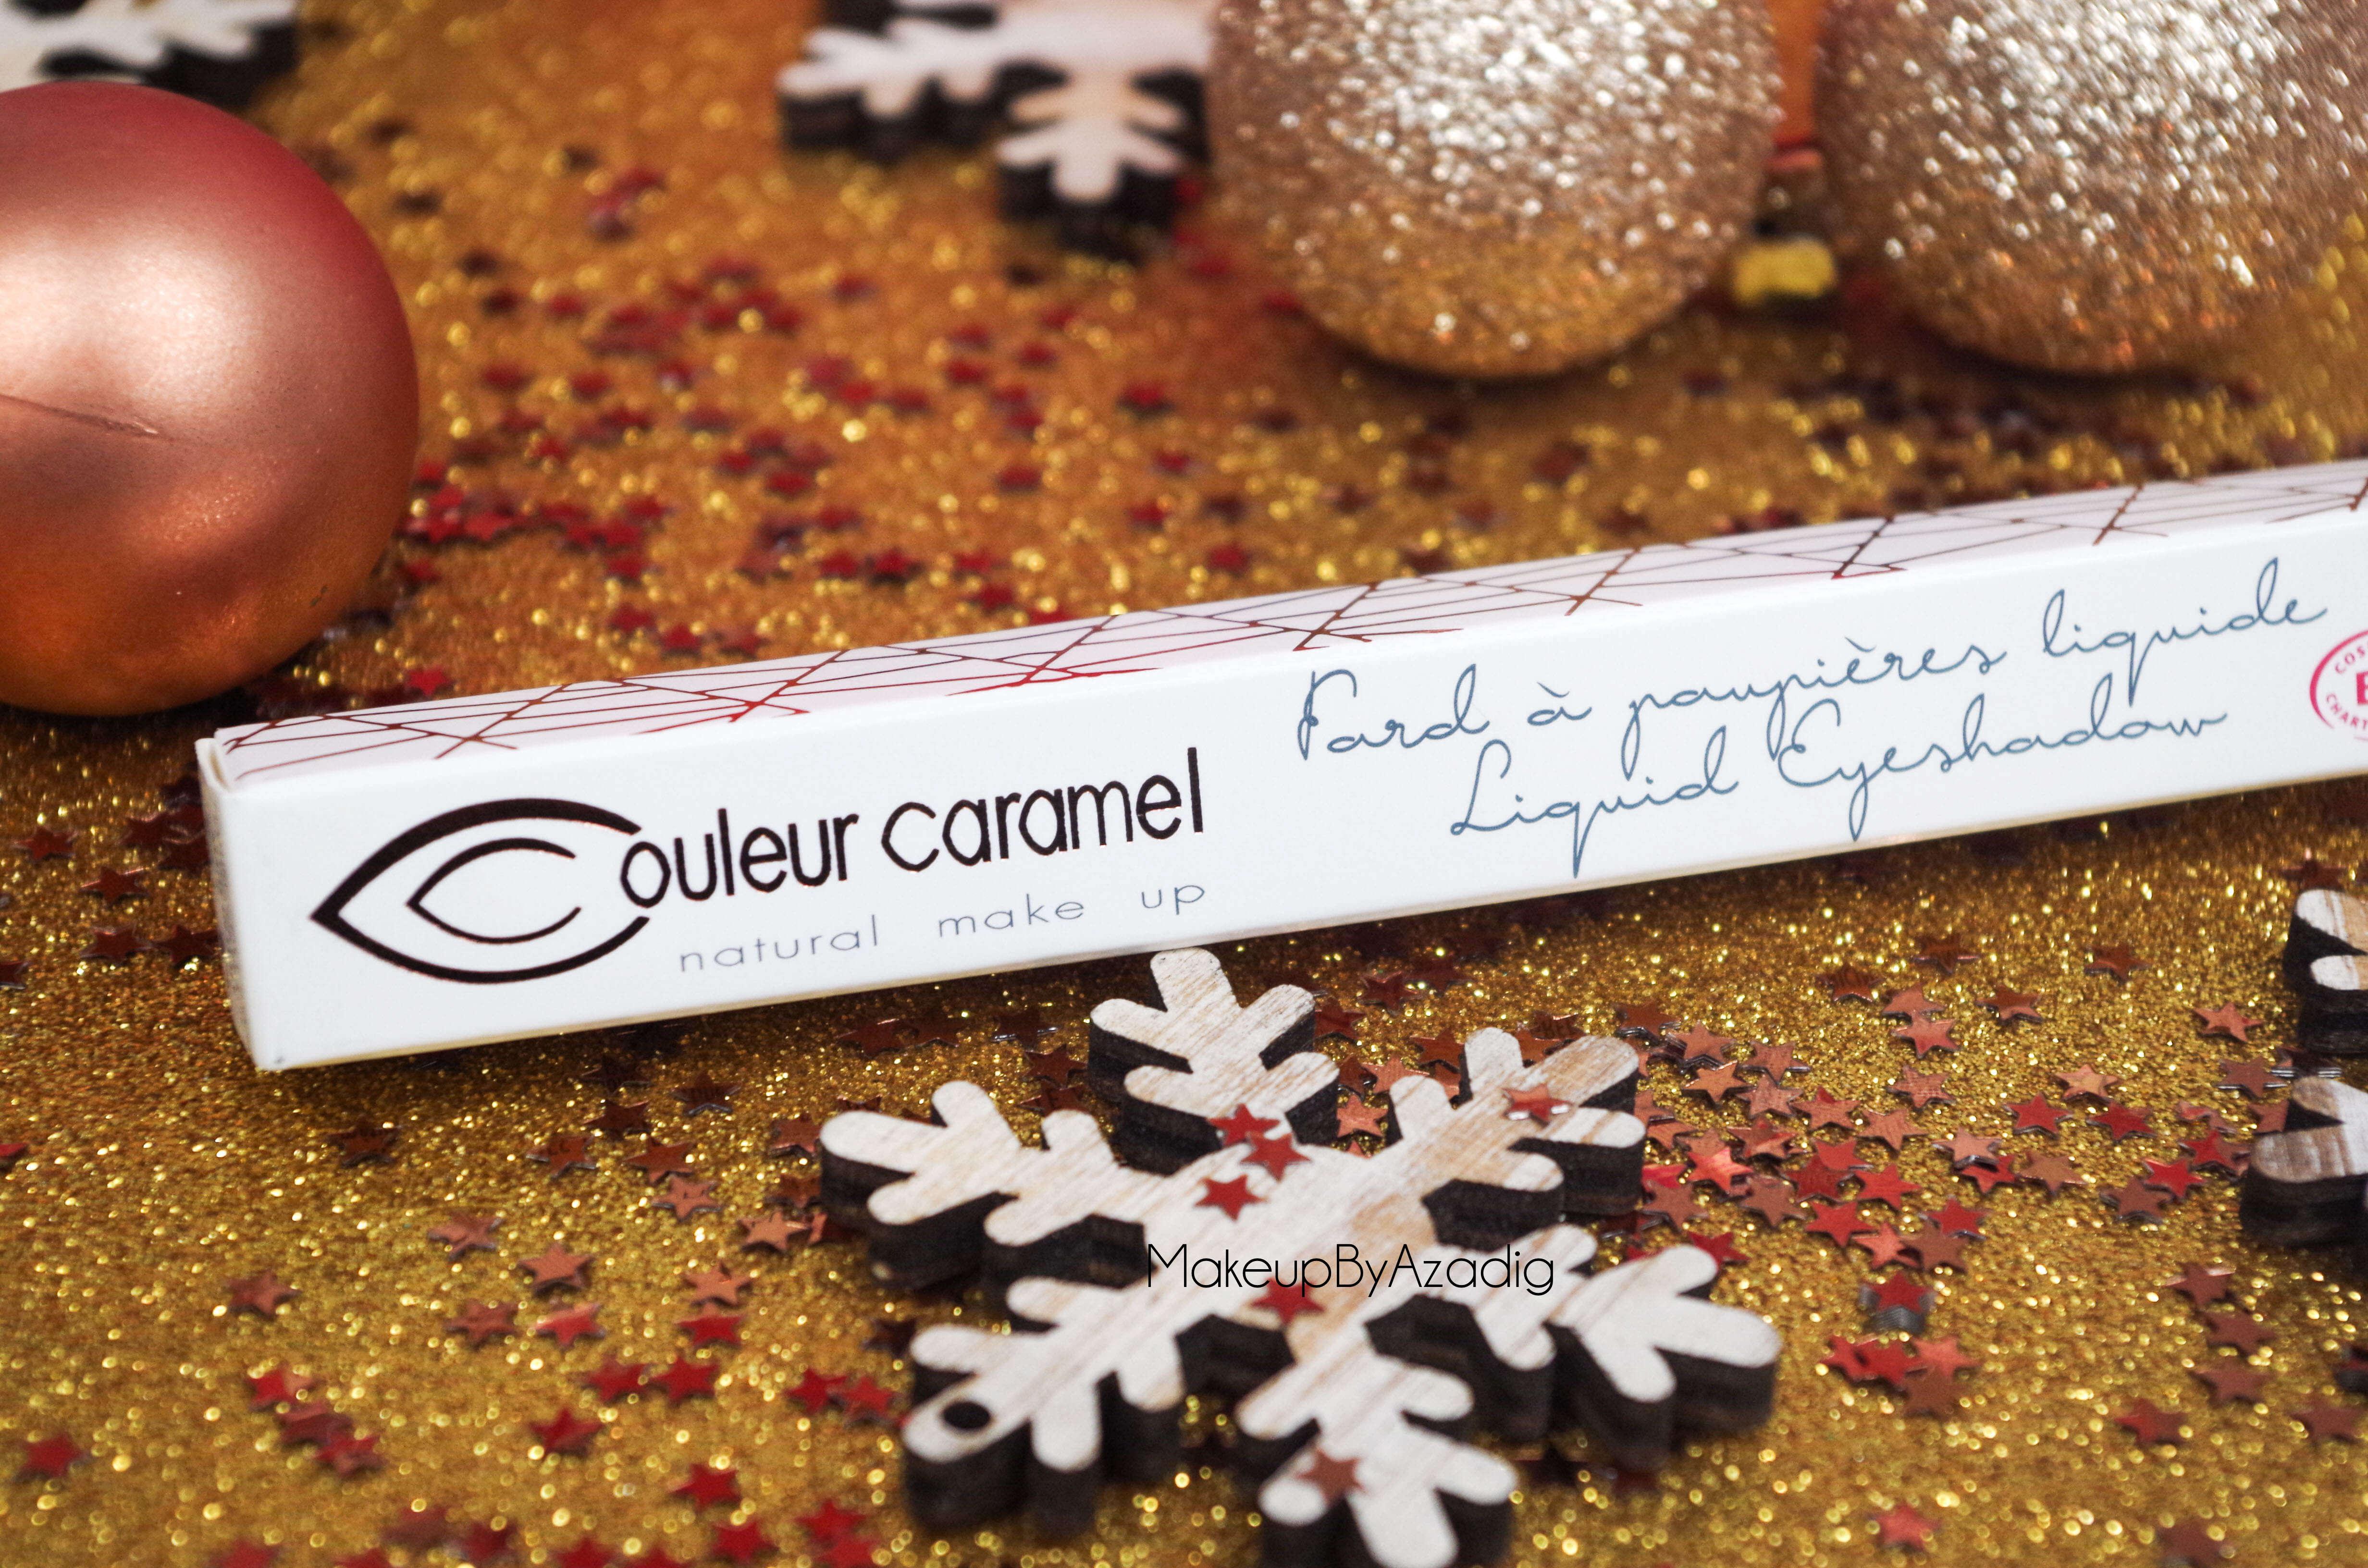 biotyfull-box-beaute-makeupbyazadig-revue-avis-prix-troyes-paris-produits-bio-couleur-caramel